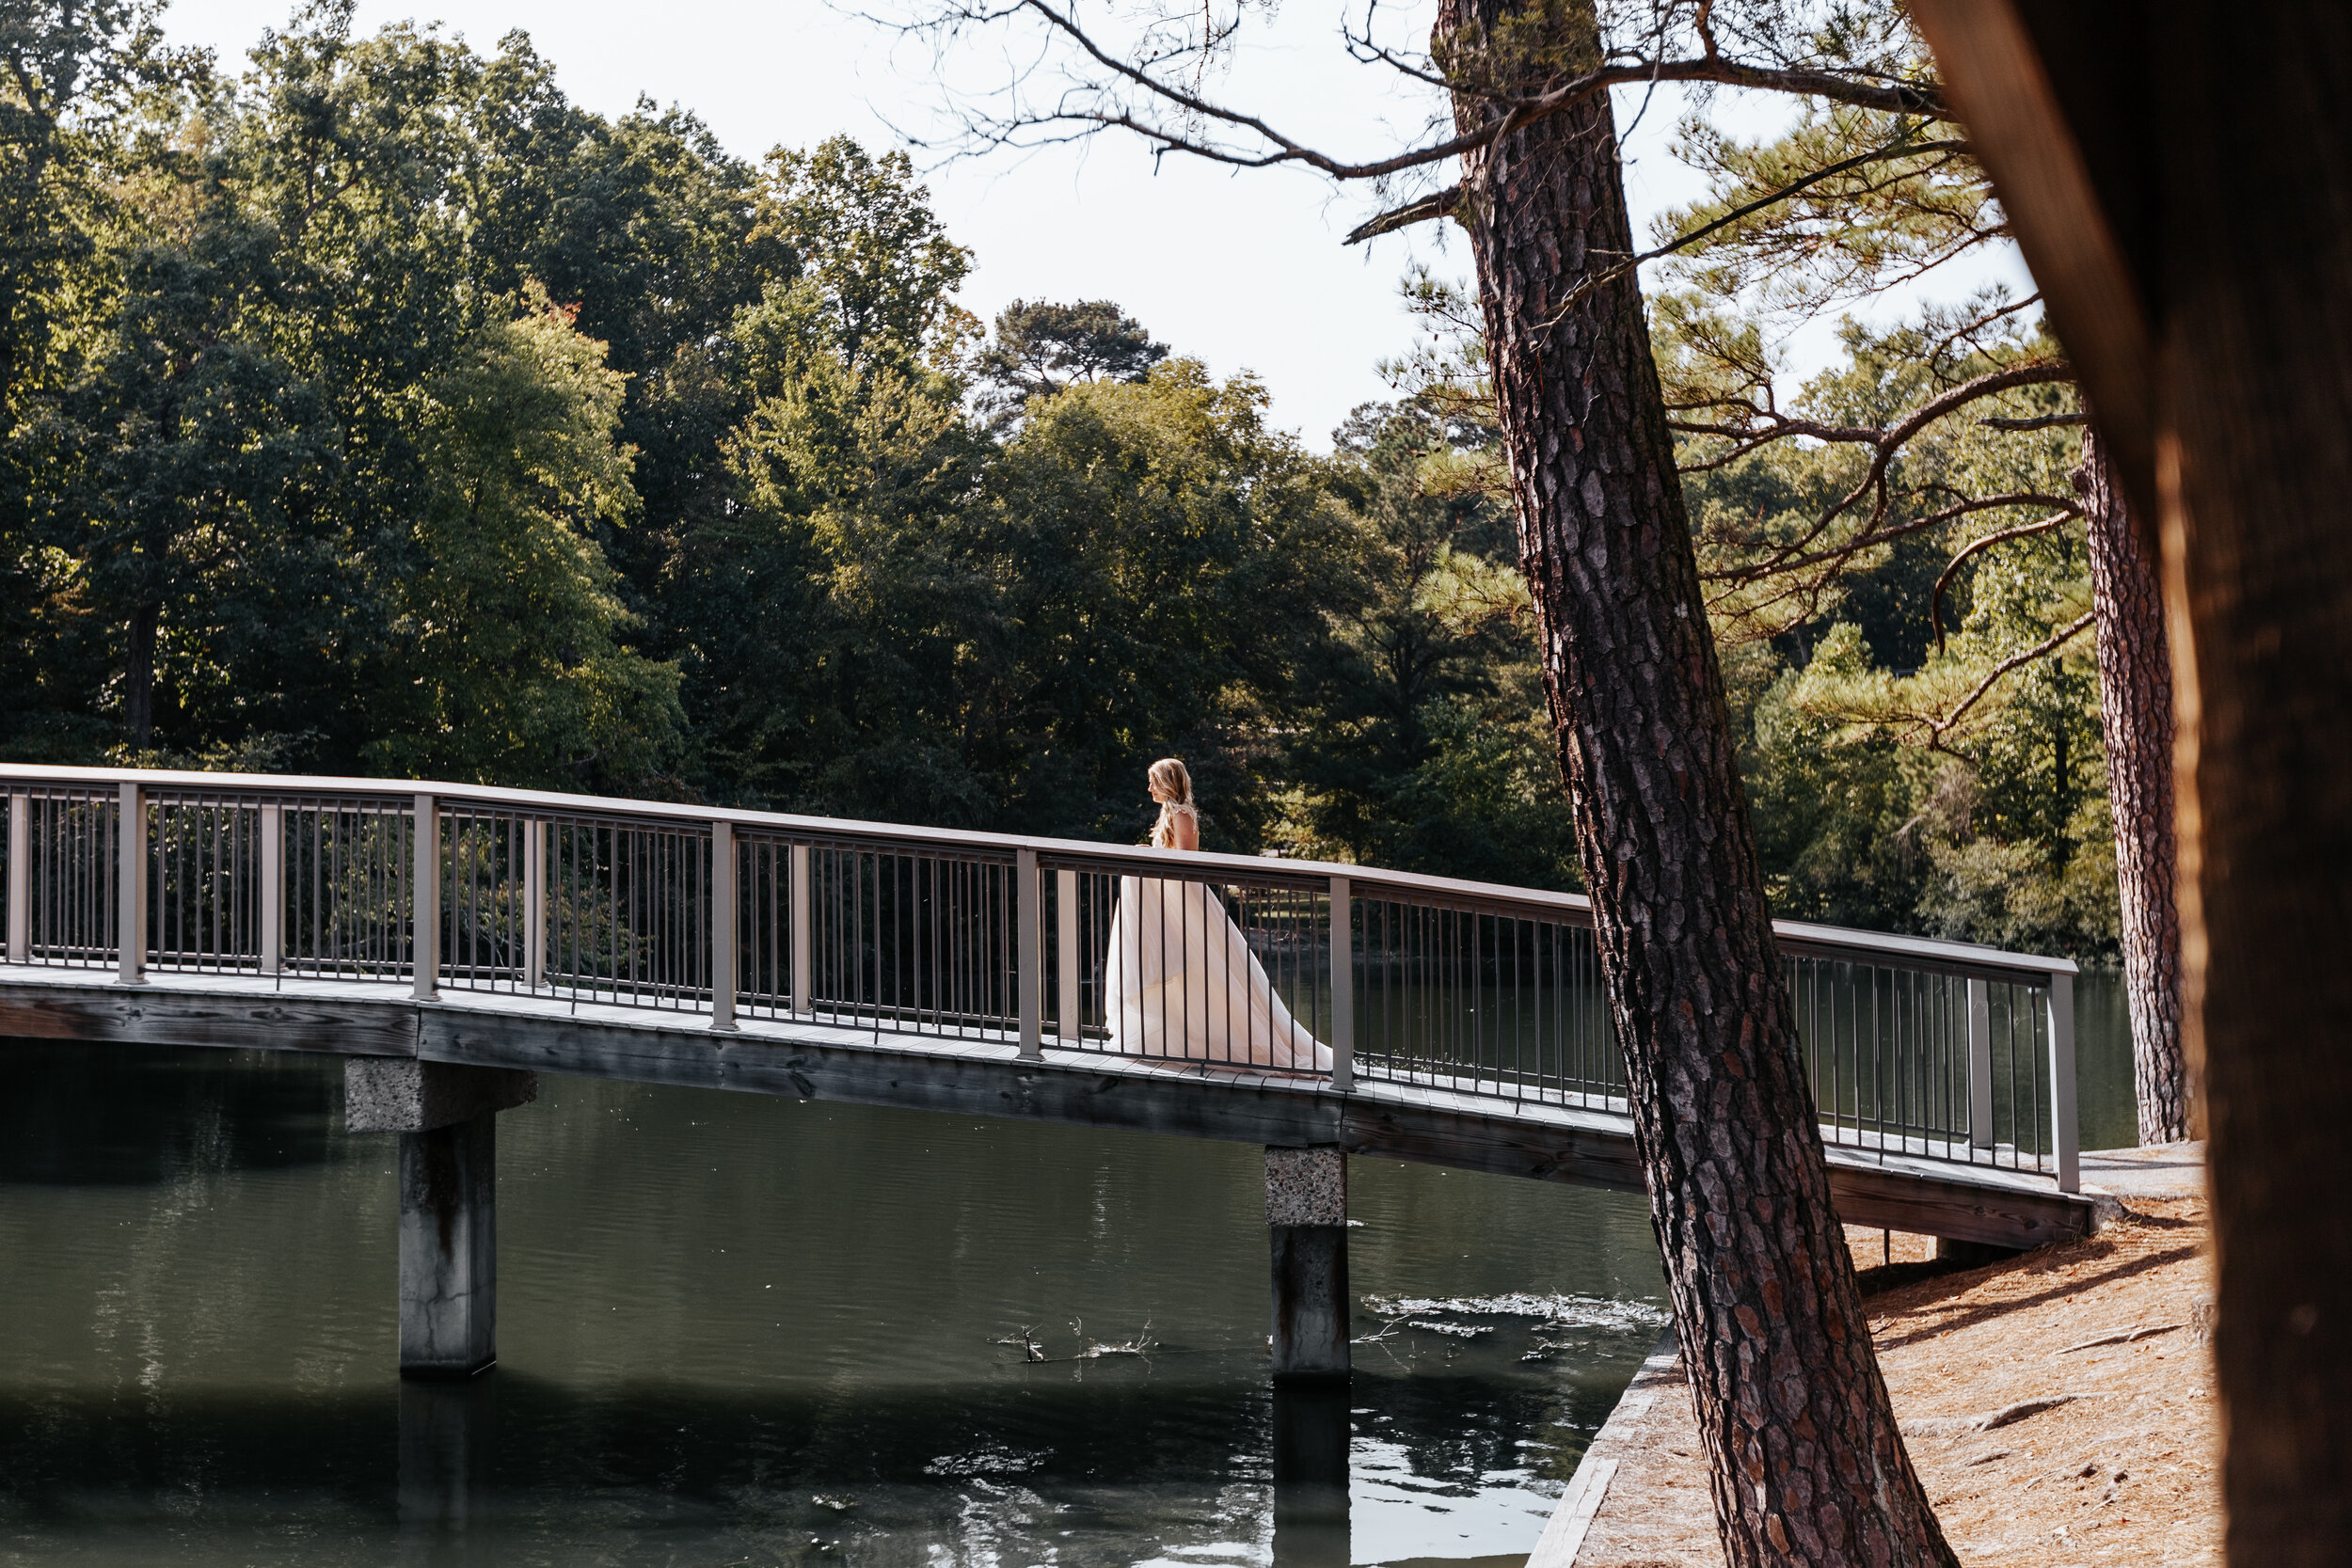 Cassie-Mrunal-Wedding-Quirk-Hotel-John-Marshall-Ballrooms-Richmond-Virginia-Photography-by-V-36.jpg